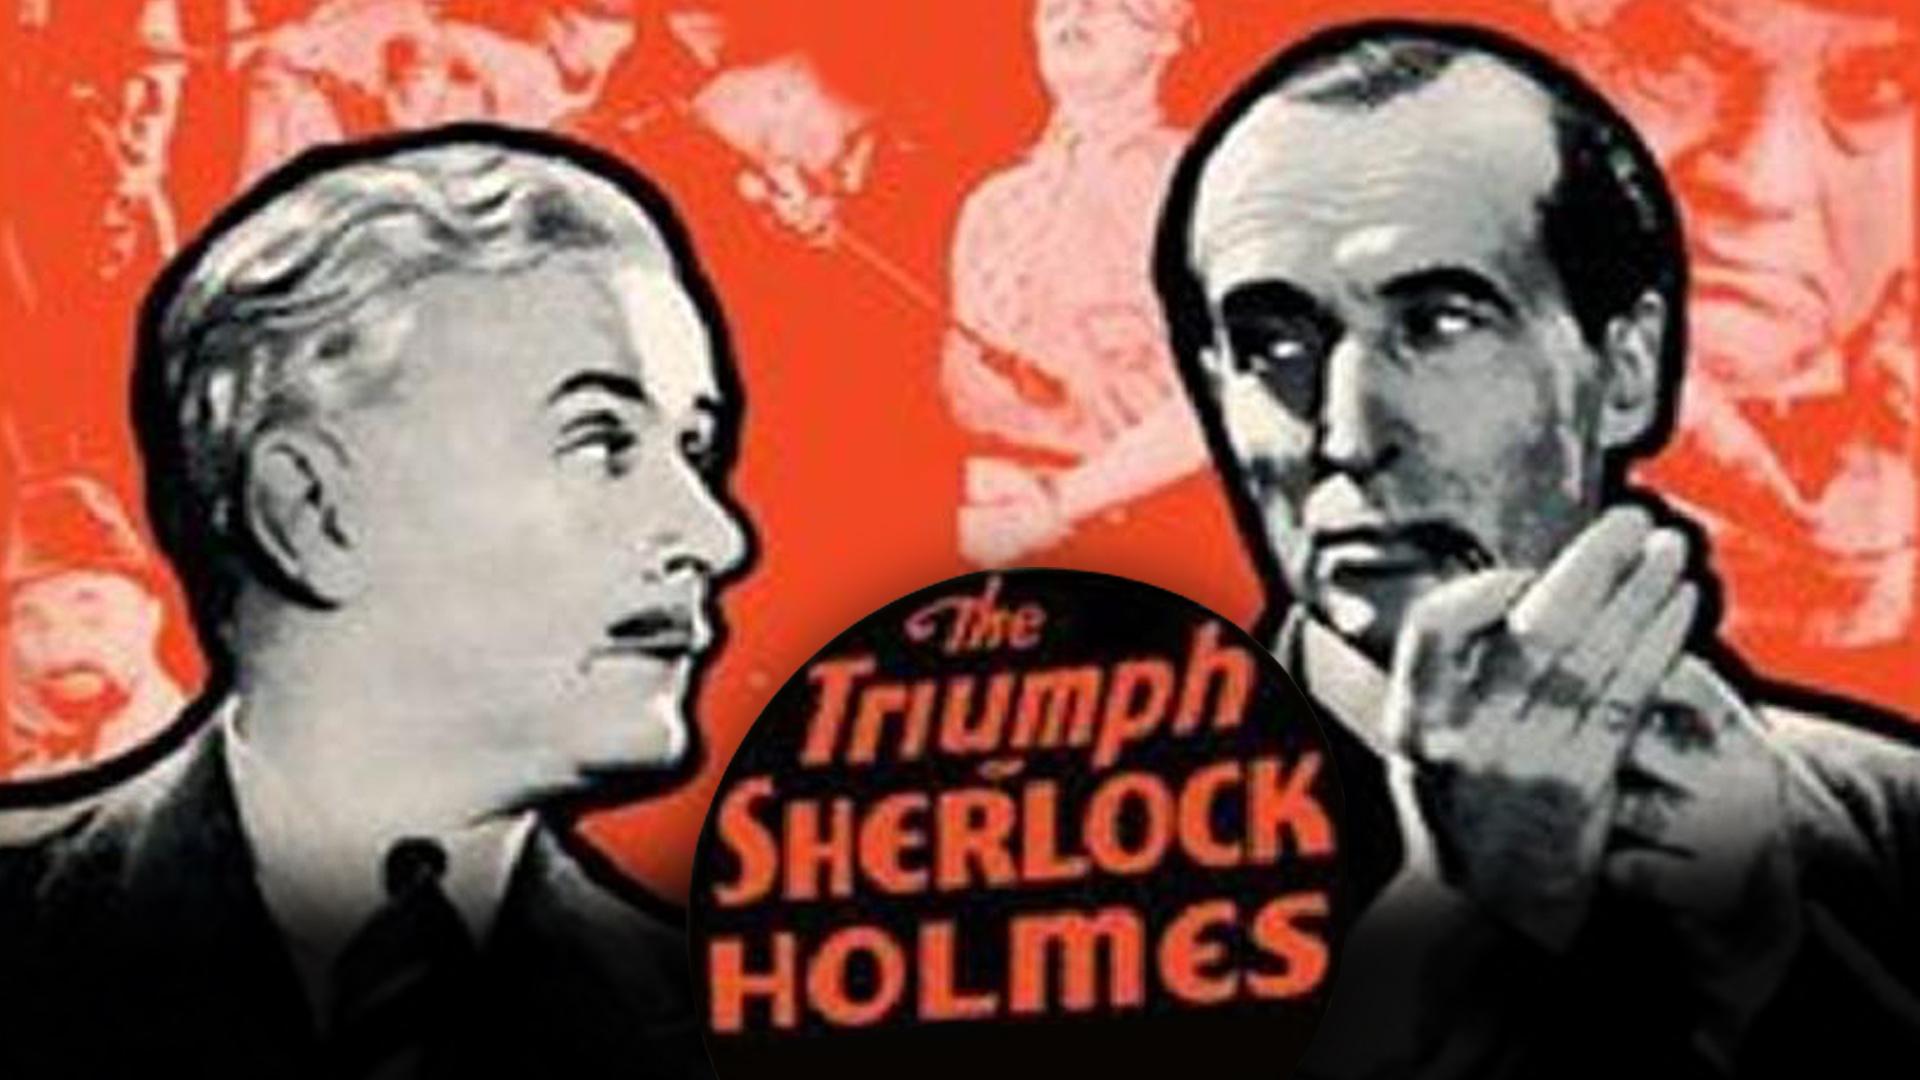 Triumph of Sherlock Holmes (1935)